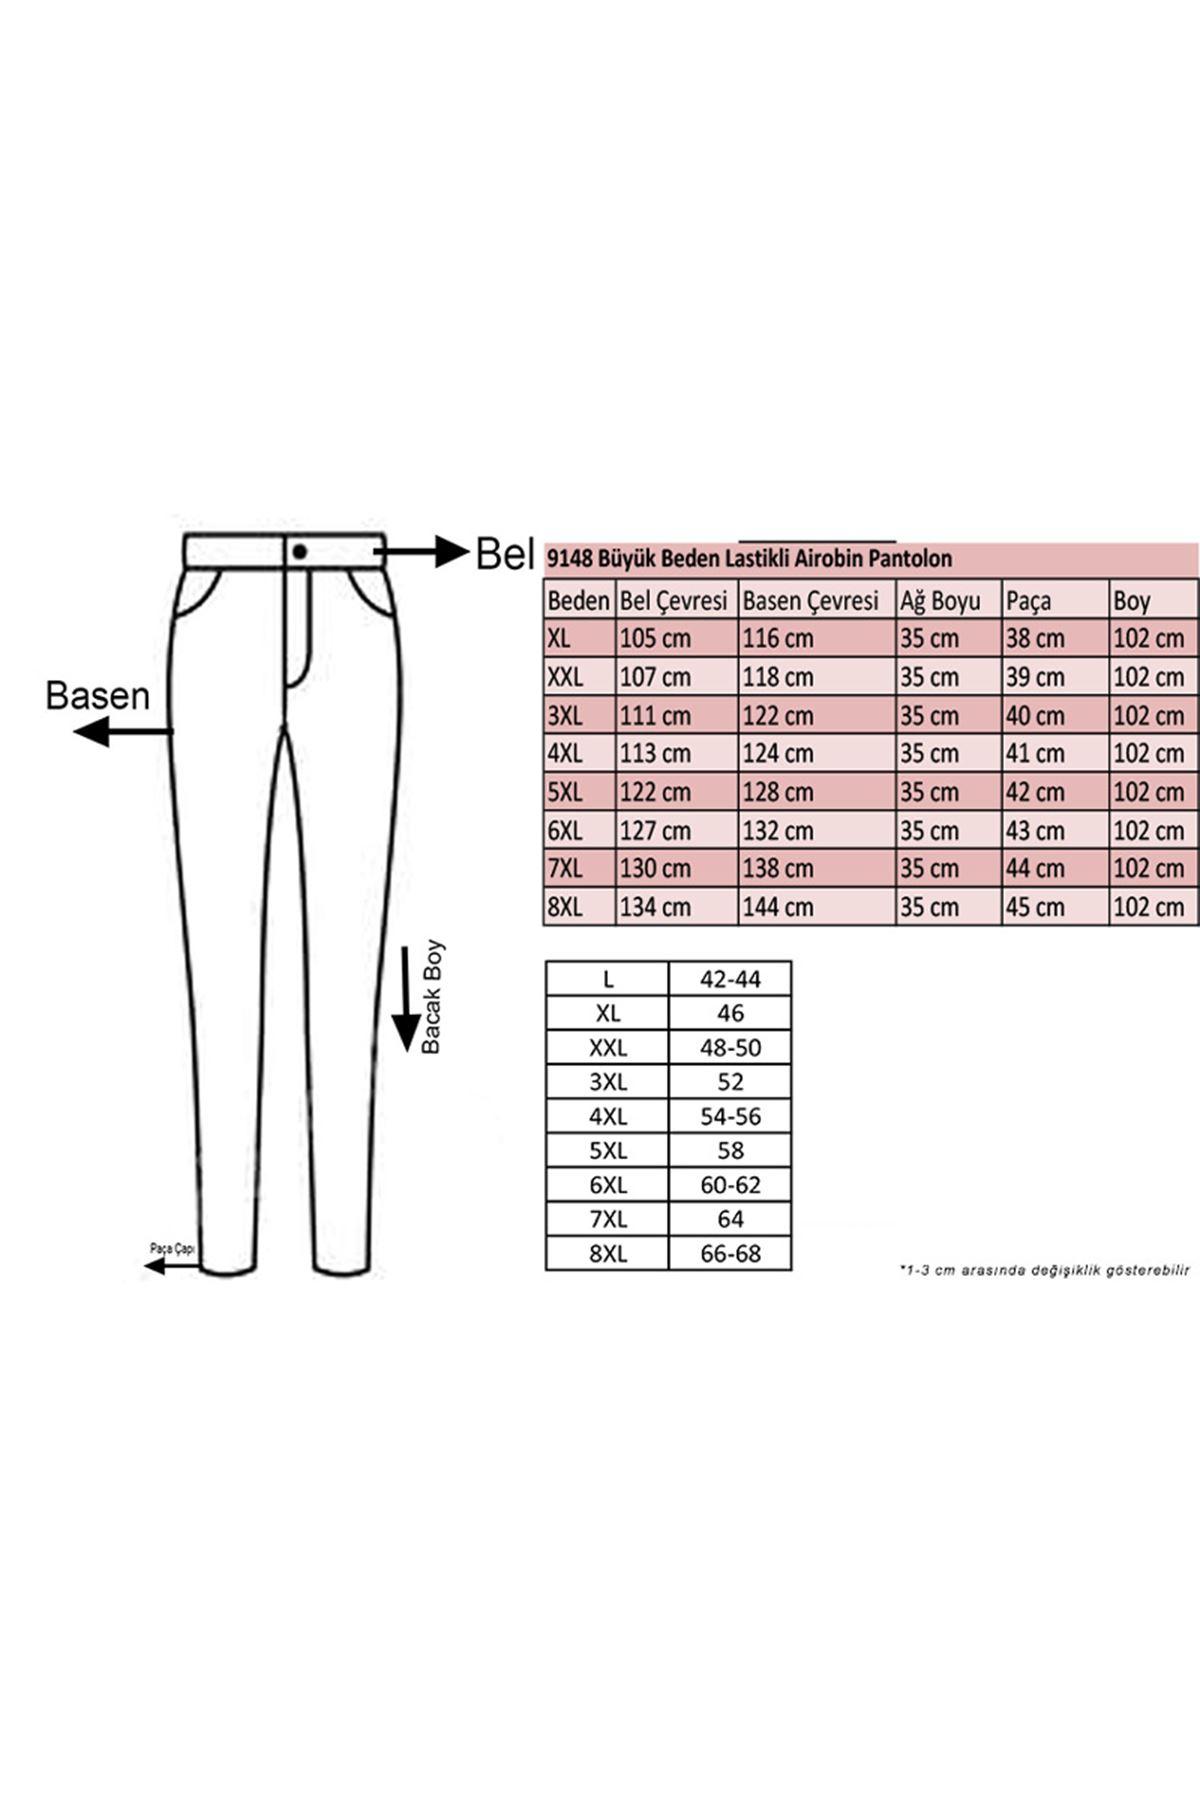 9148 Büyük Beden Lastikli Airobin Pantolon - Açık Vizon